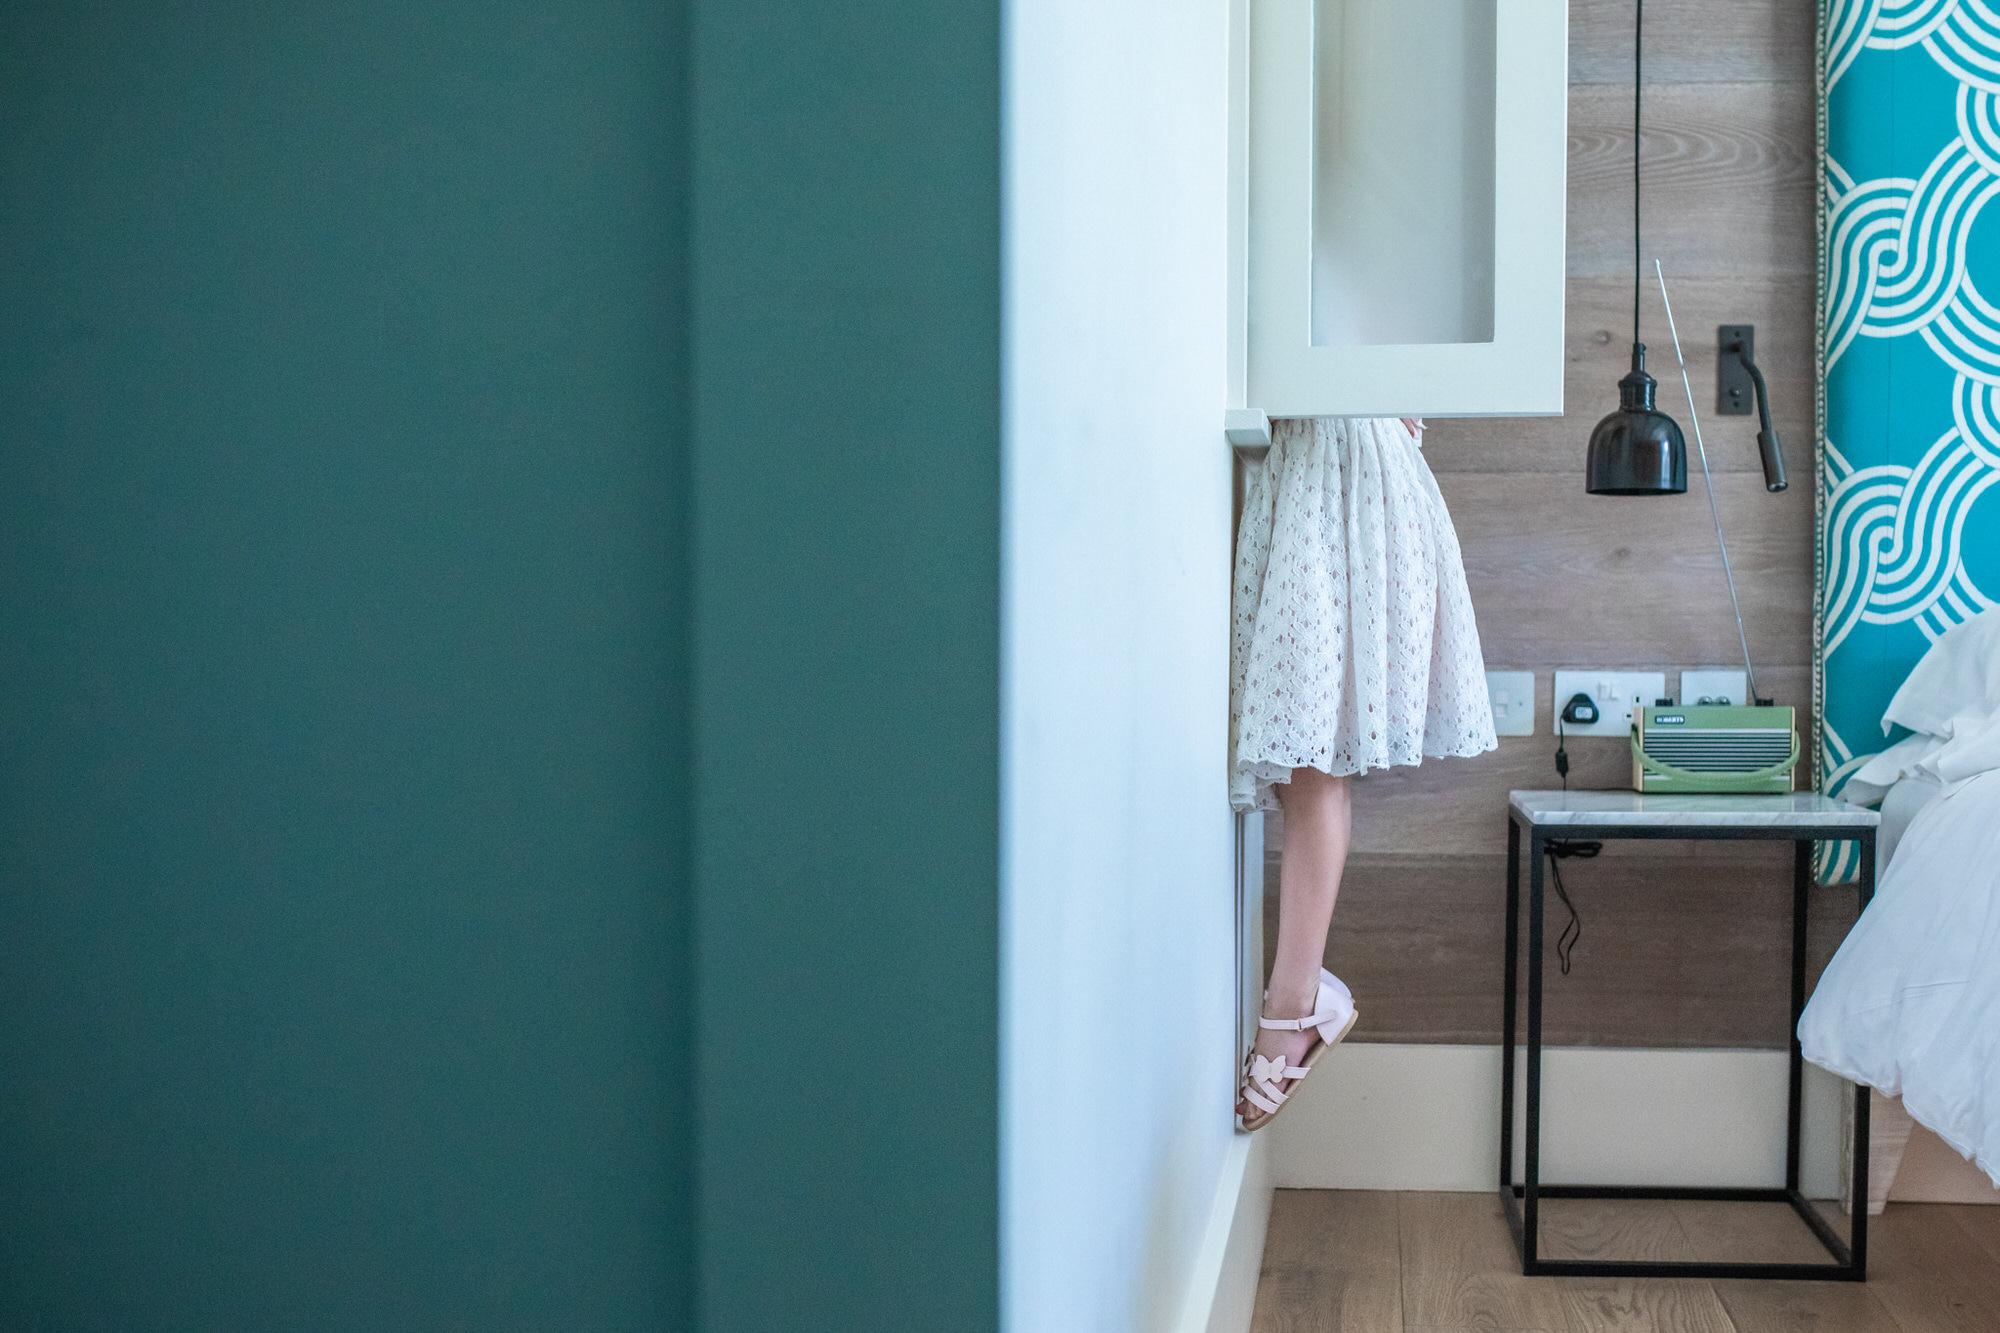 child in dress peeking through window, photographed by Hitchin christening photographer